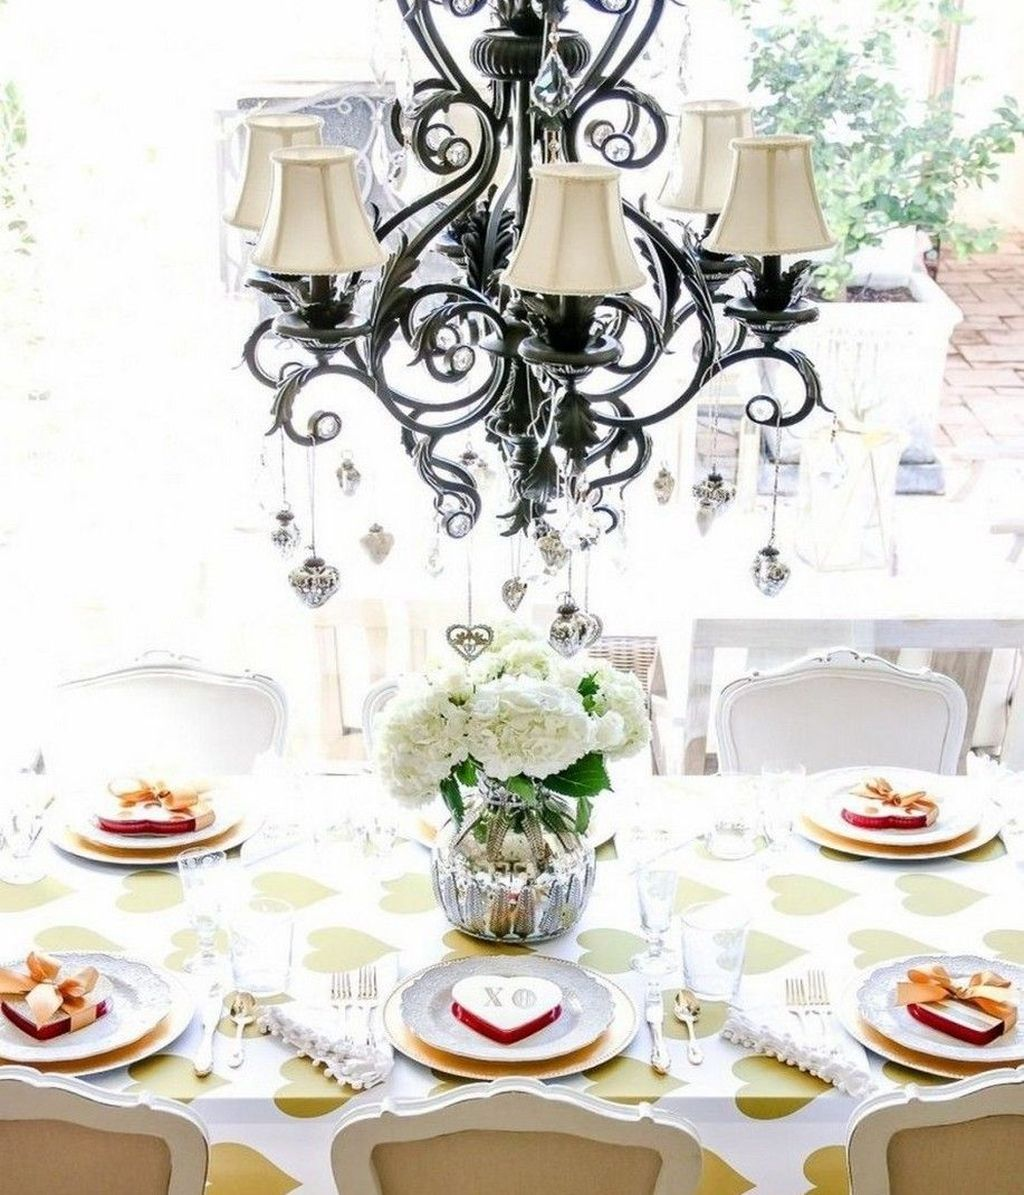 Inspiring Romantic Dining Table Decor Ideas 16